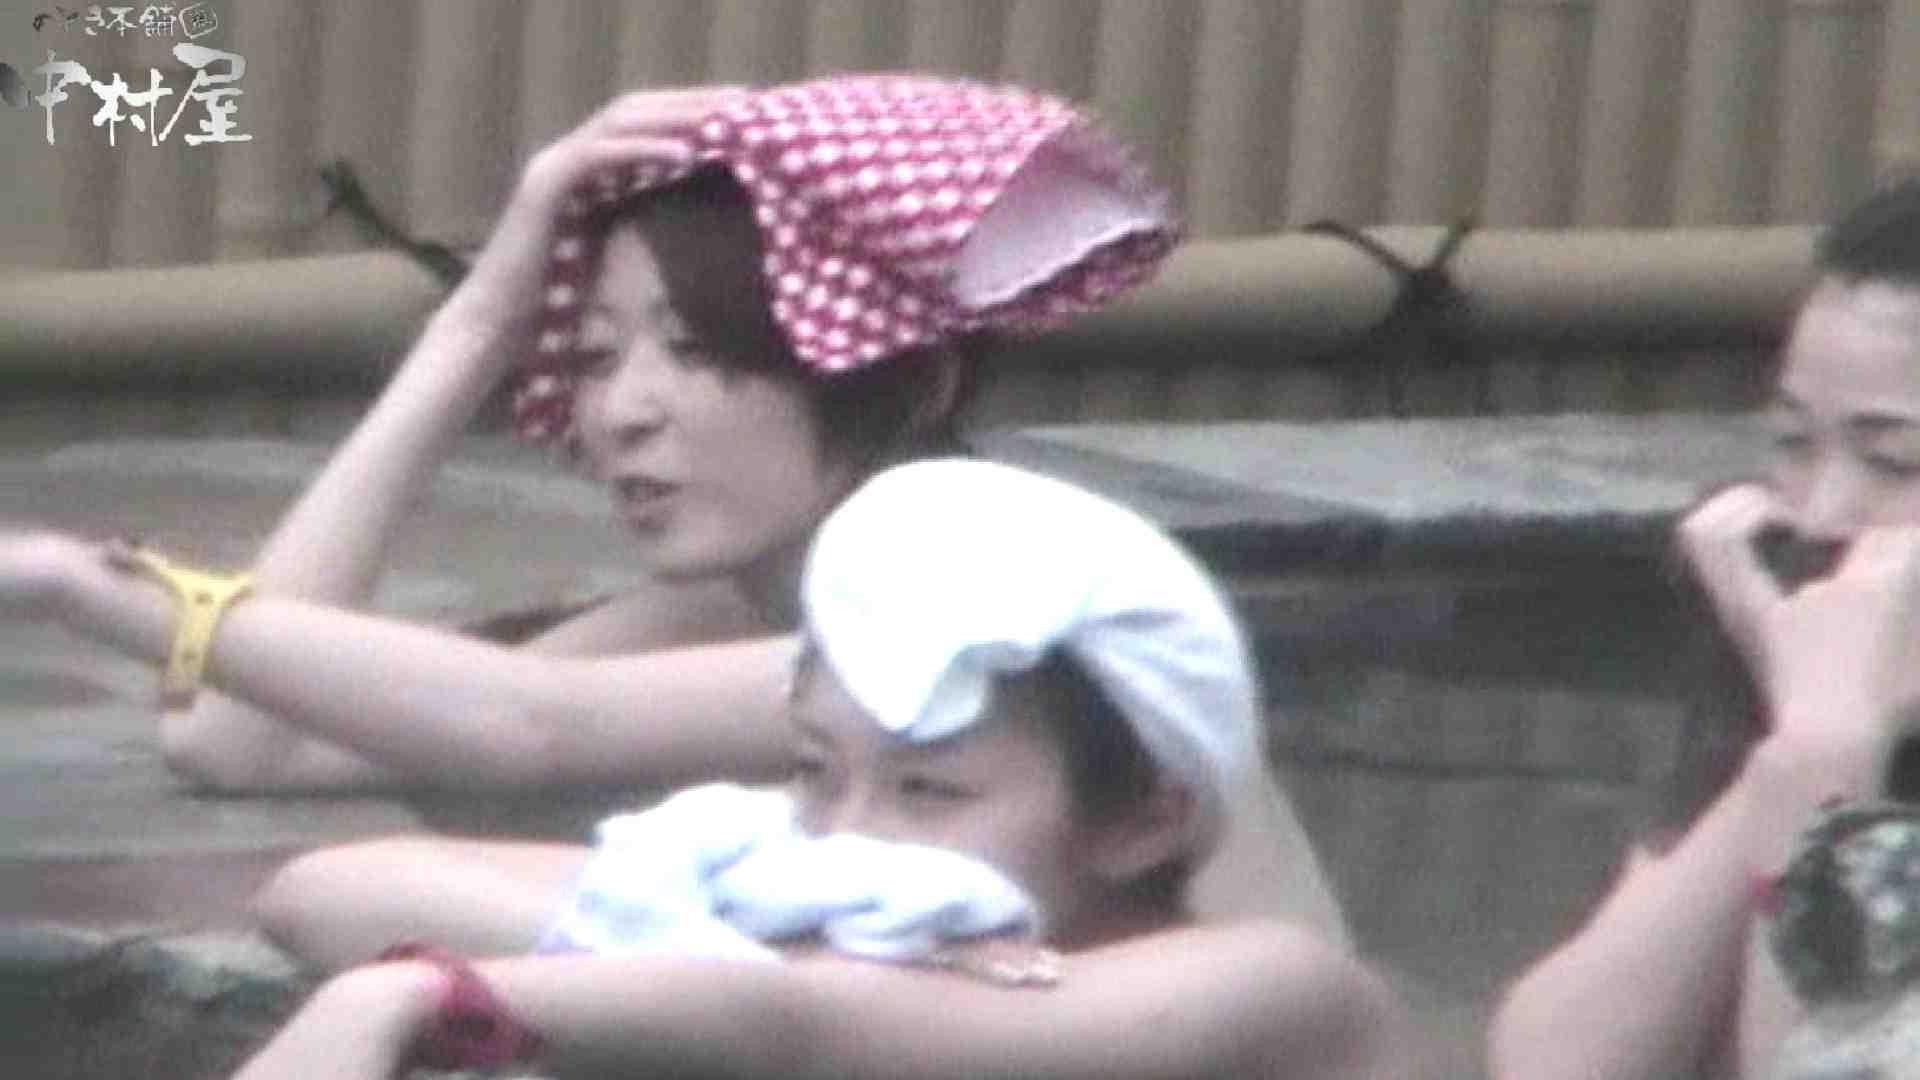 Aquaな露天風呂Vol.554 美しいOLの裸体 AV無料 86pic 77